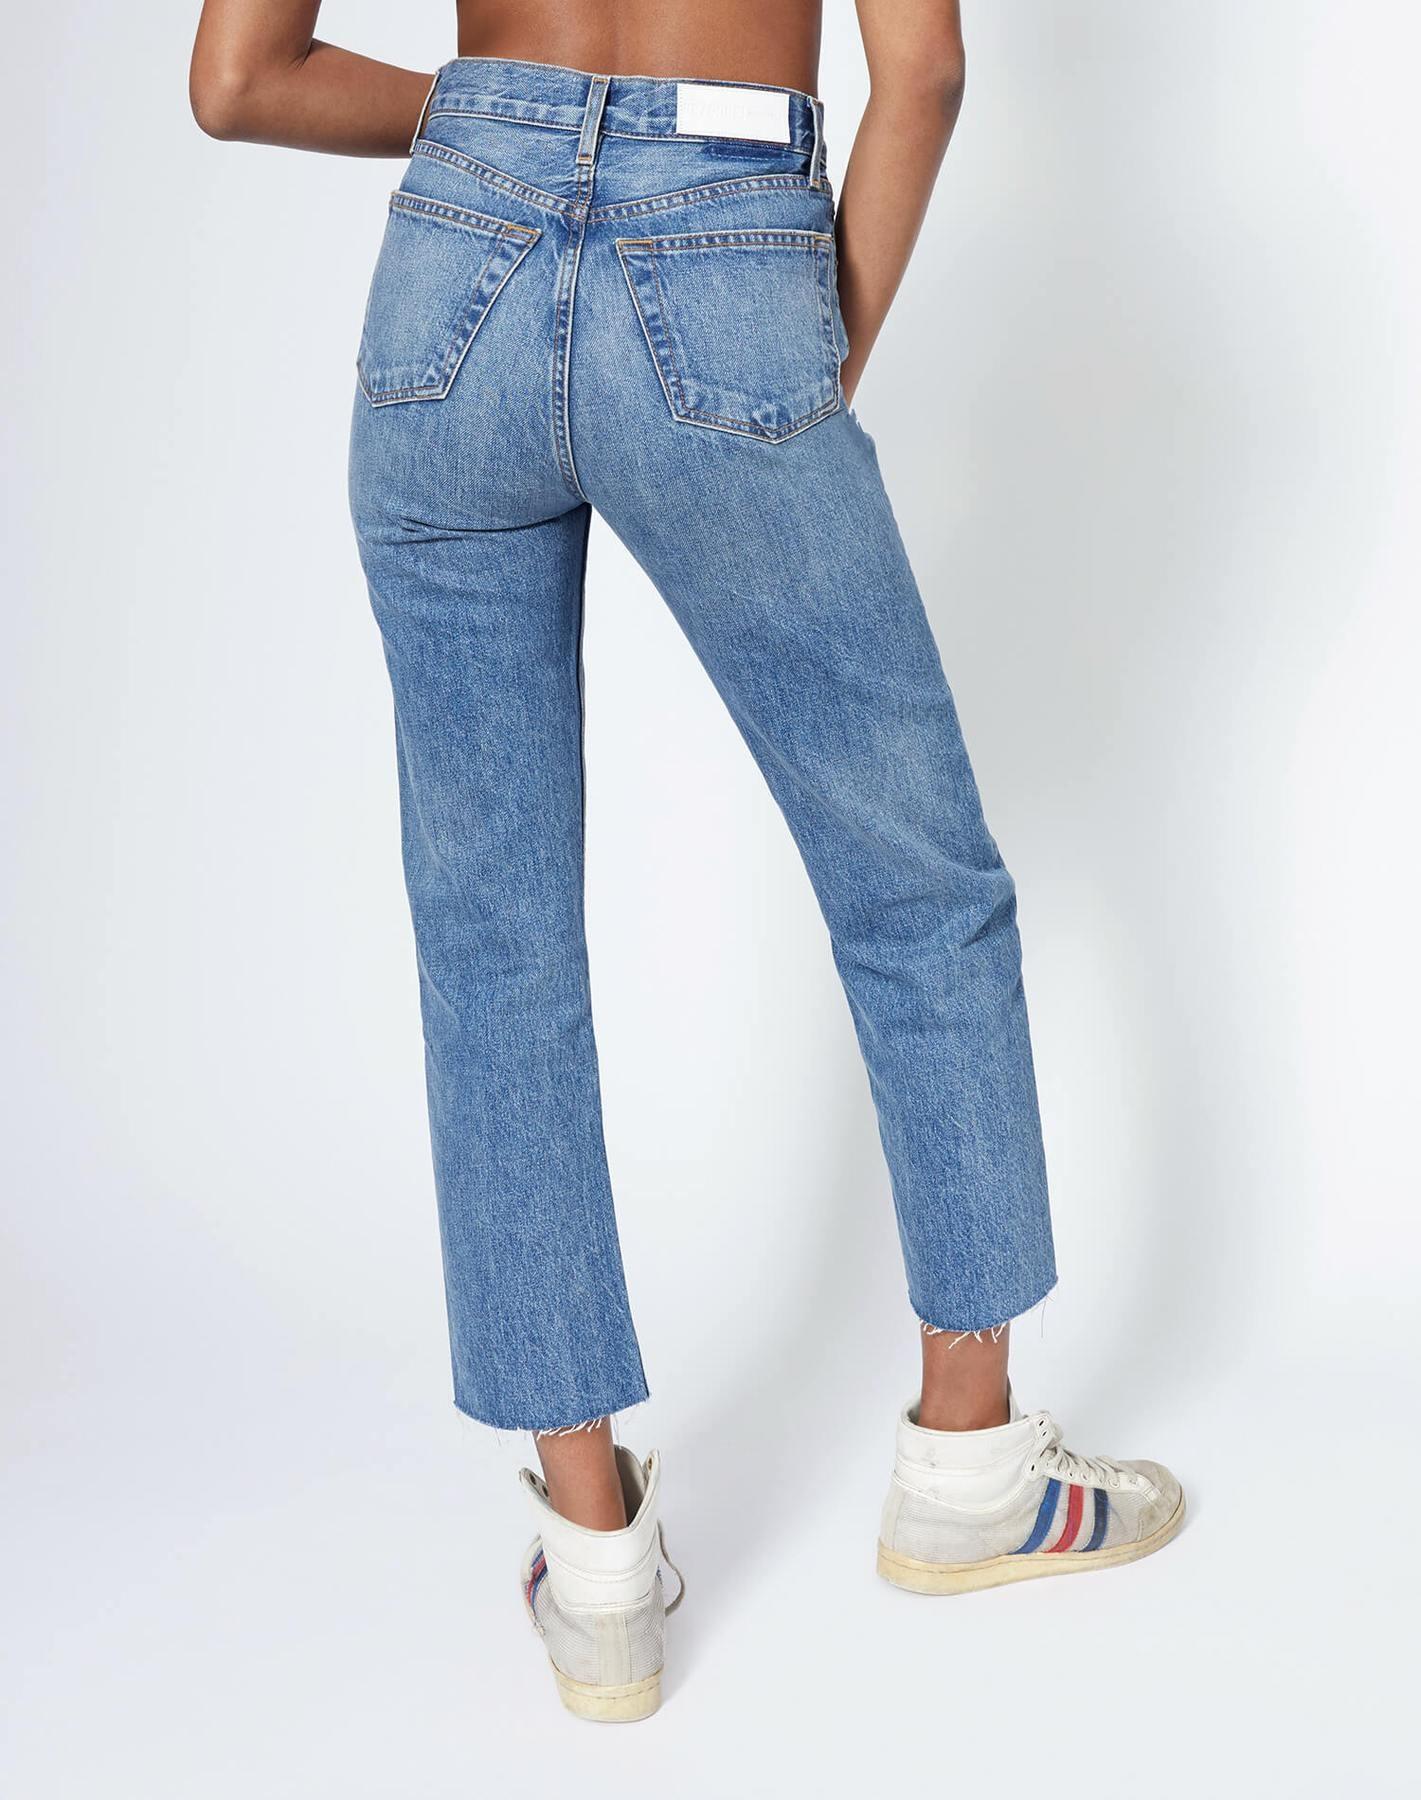 70s Stove Pipe Jeans Medium Vain